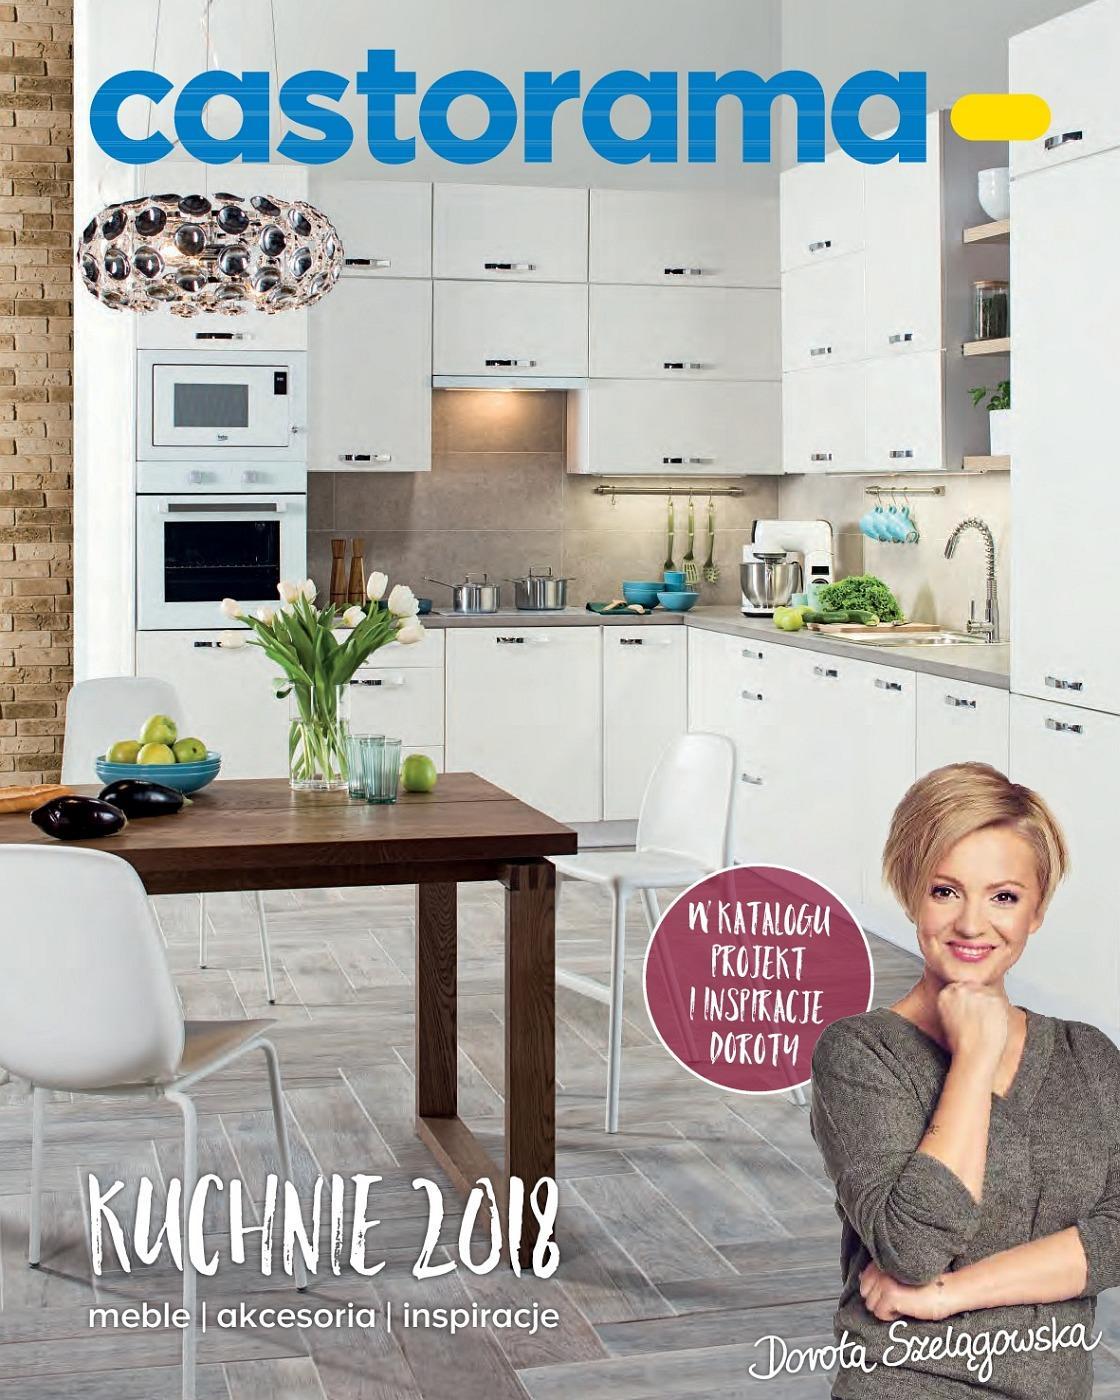 Gazetka promocyjna Castorama do 31/12/2018 str.1